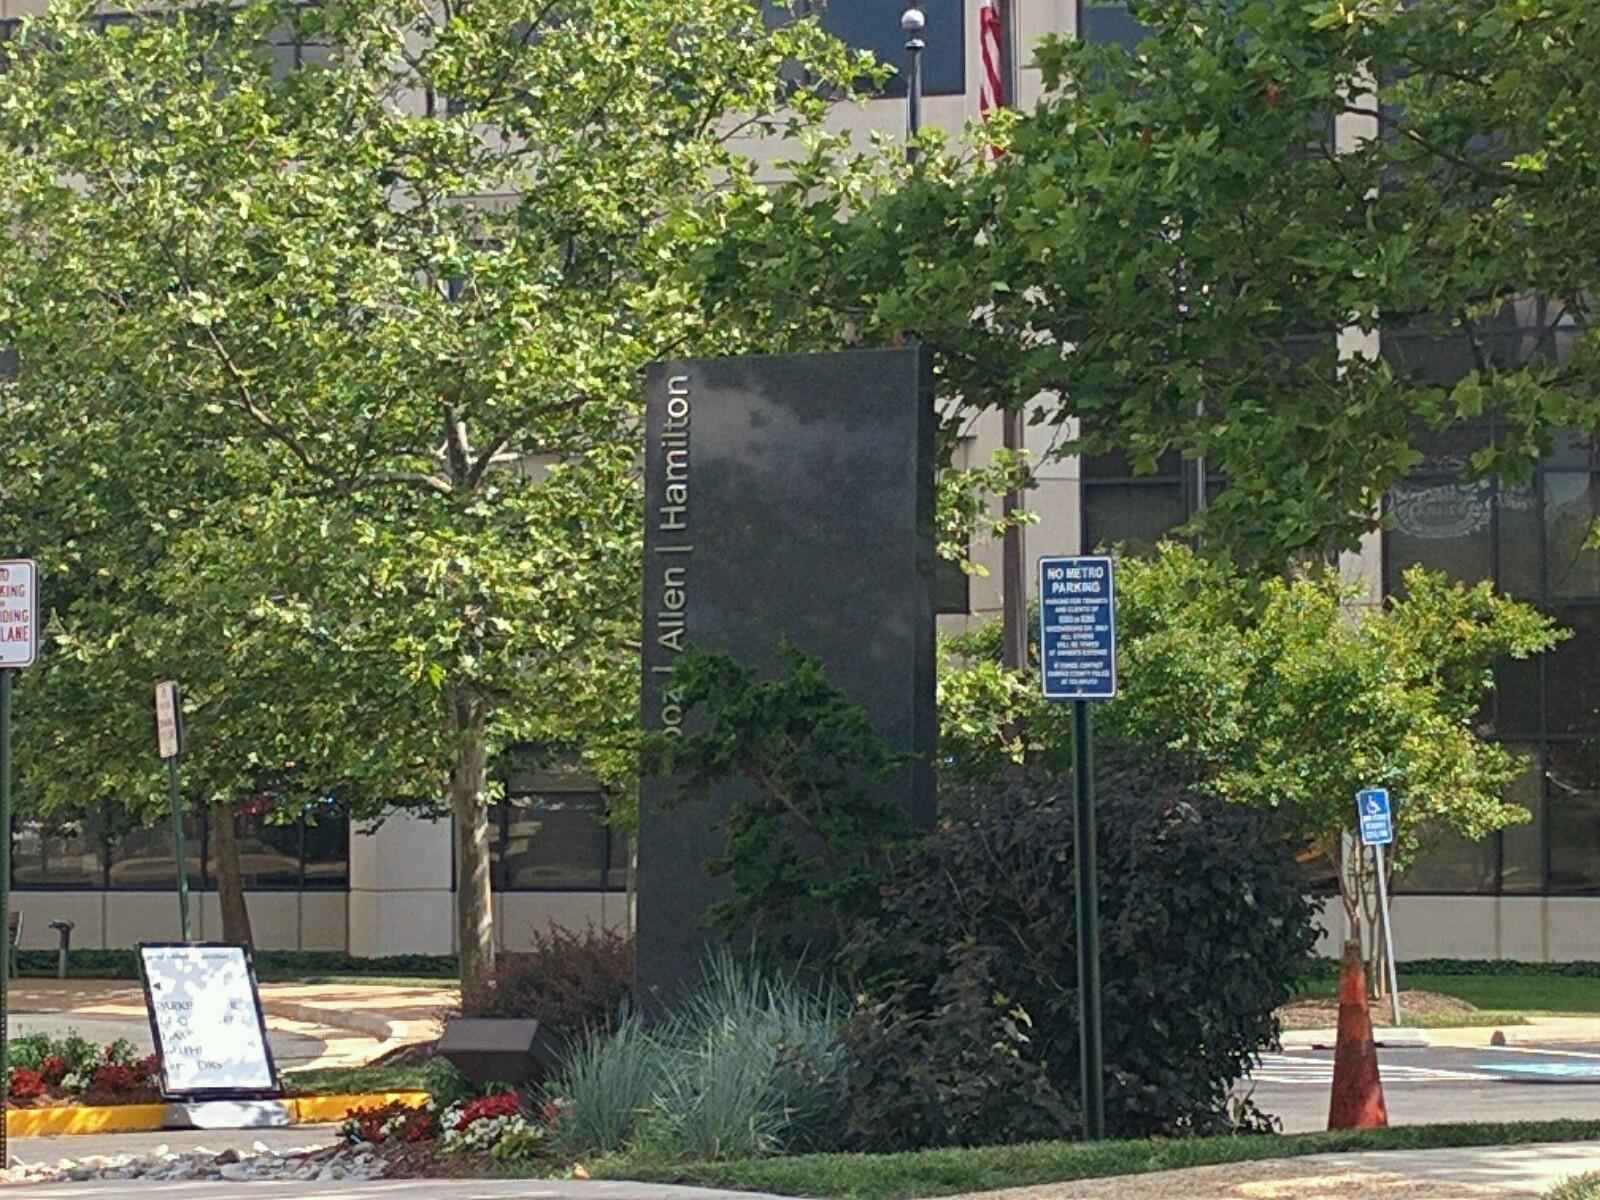 Entrance to Booz Allen Hamilton's corporate headquarters in McLean, Virginia.